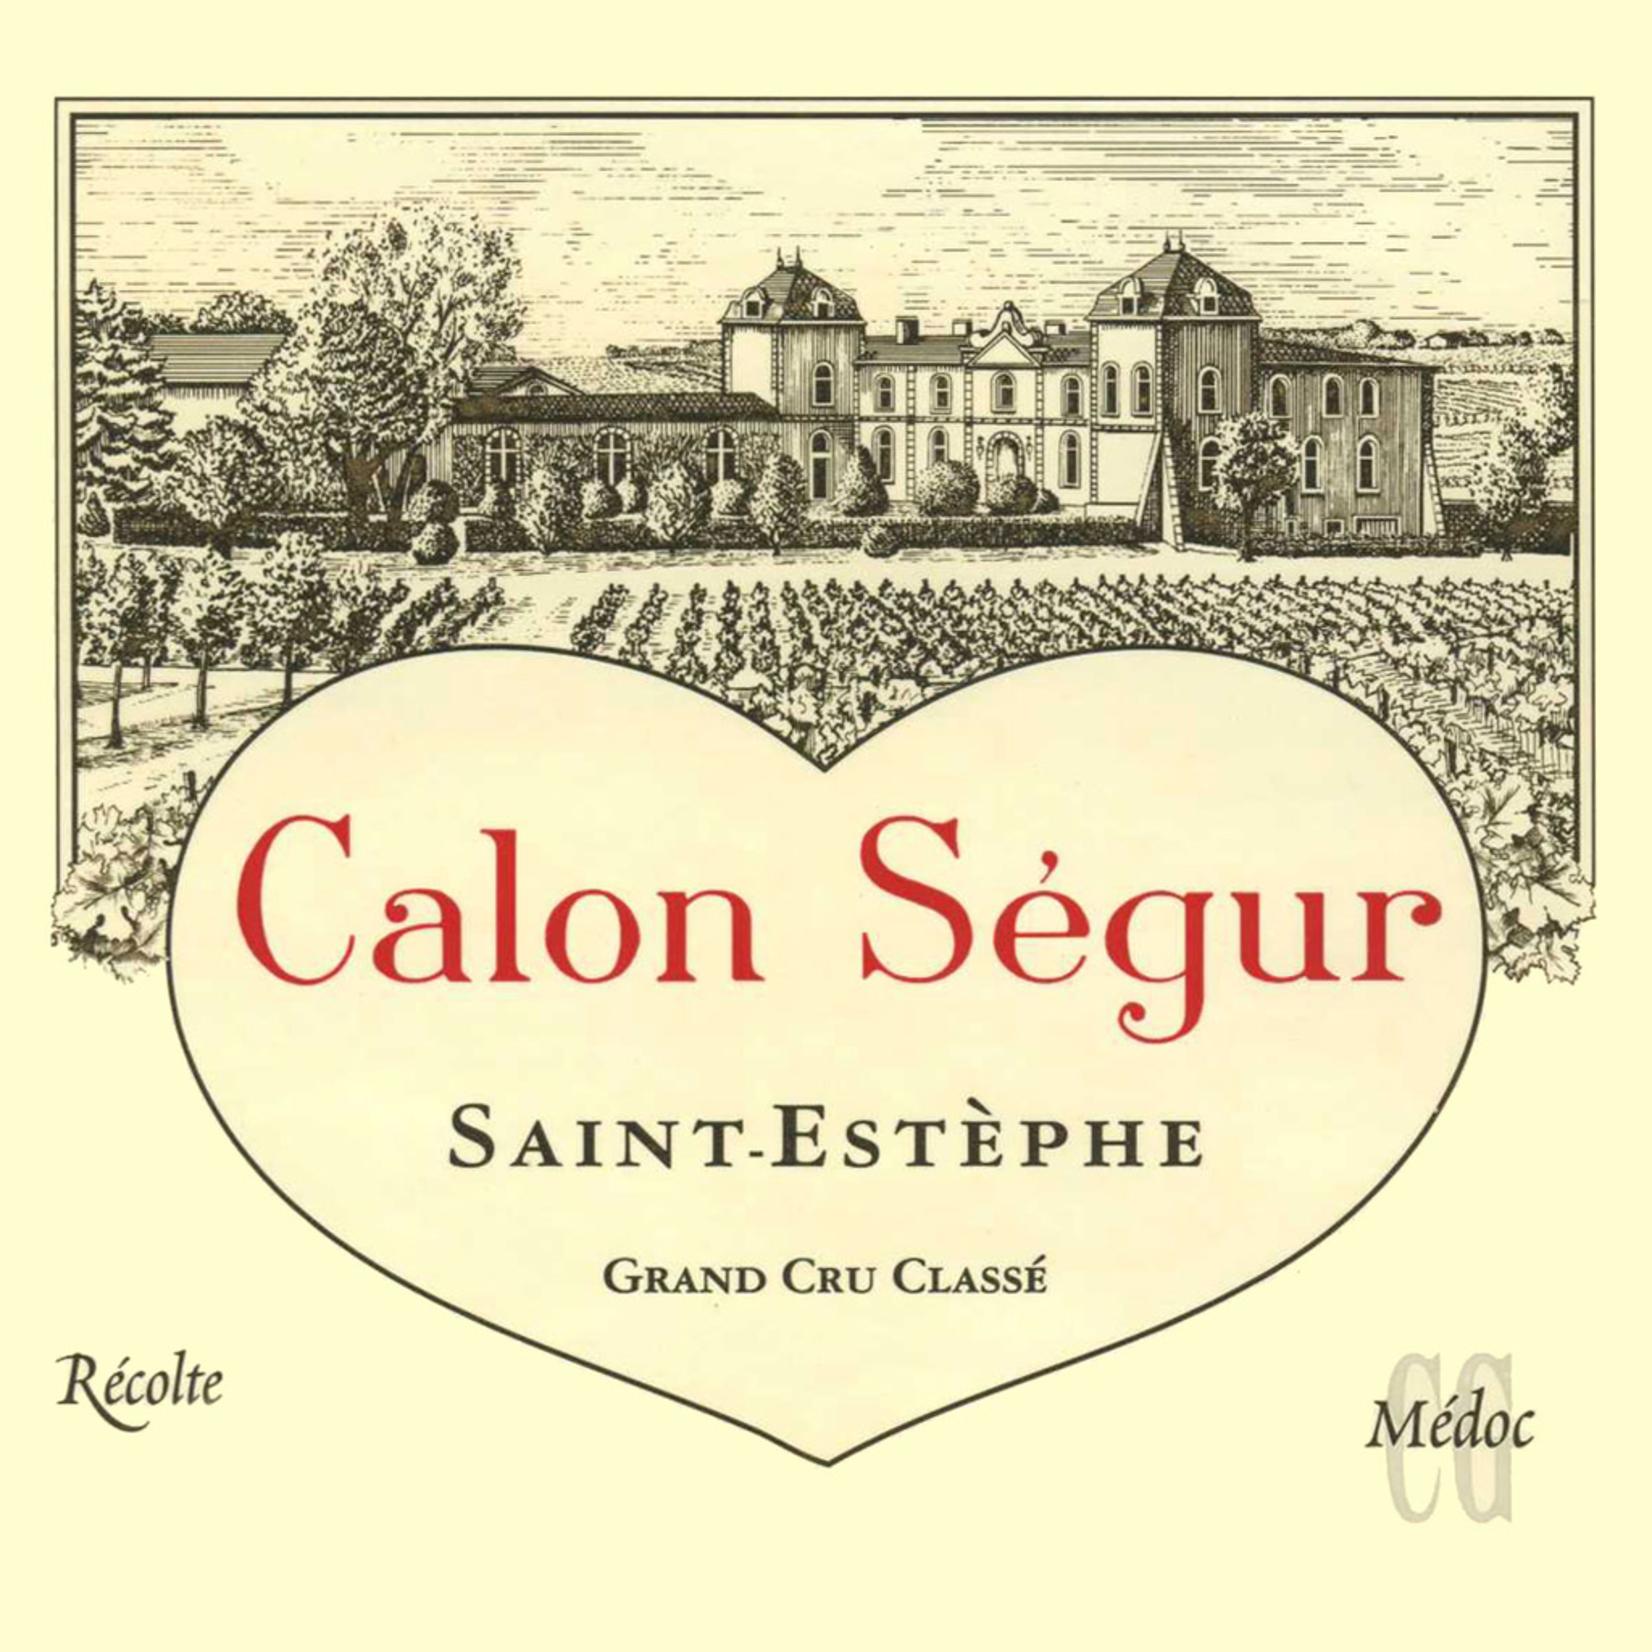 Chateau Calon Segur 2007